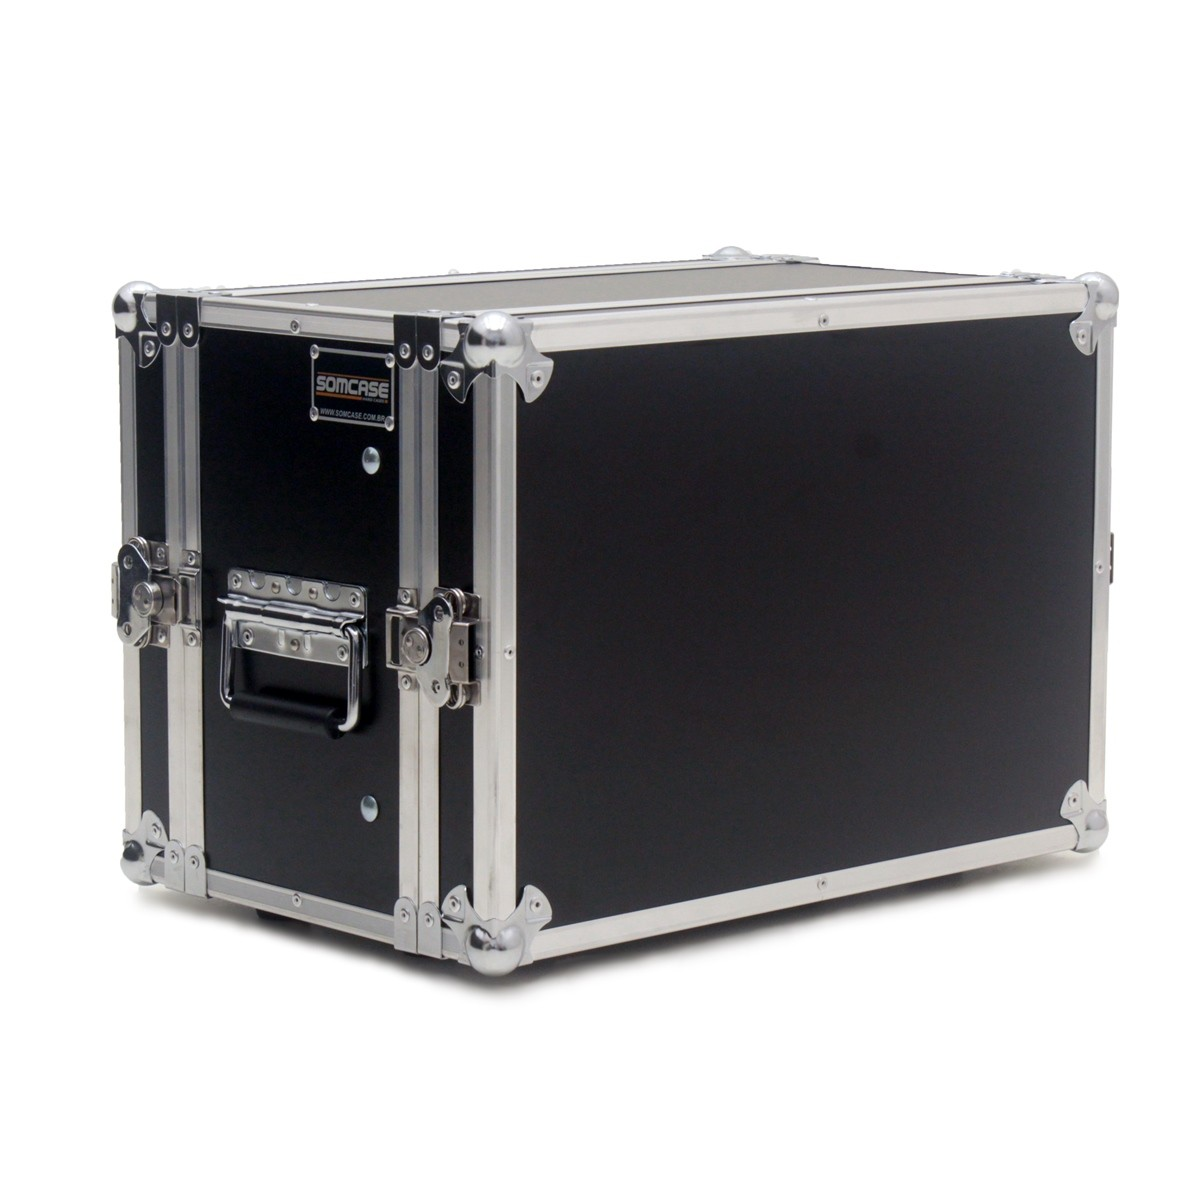 Hard Case Rack Mesa Soundcraft Mixer Ui16 + 3U